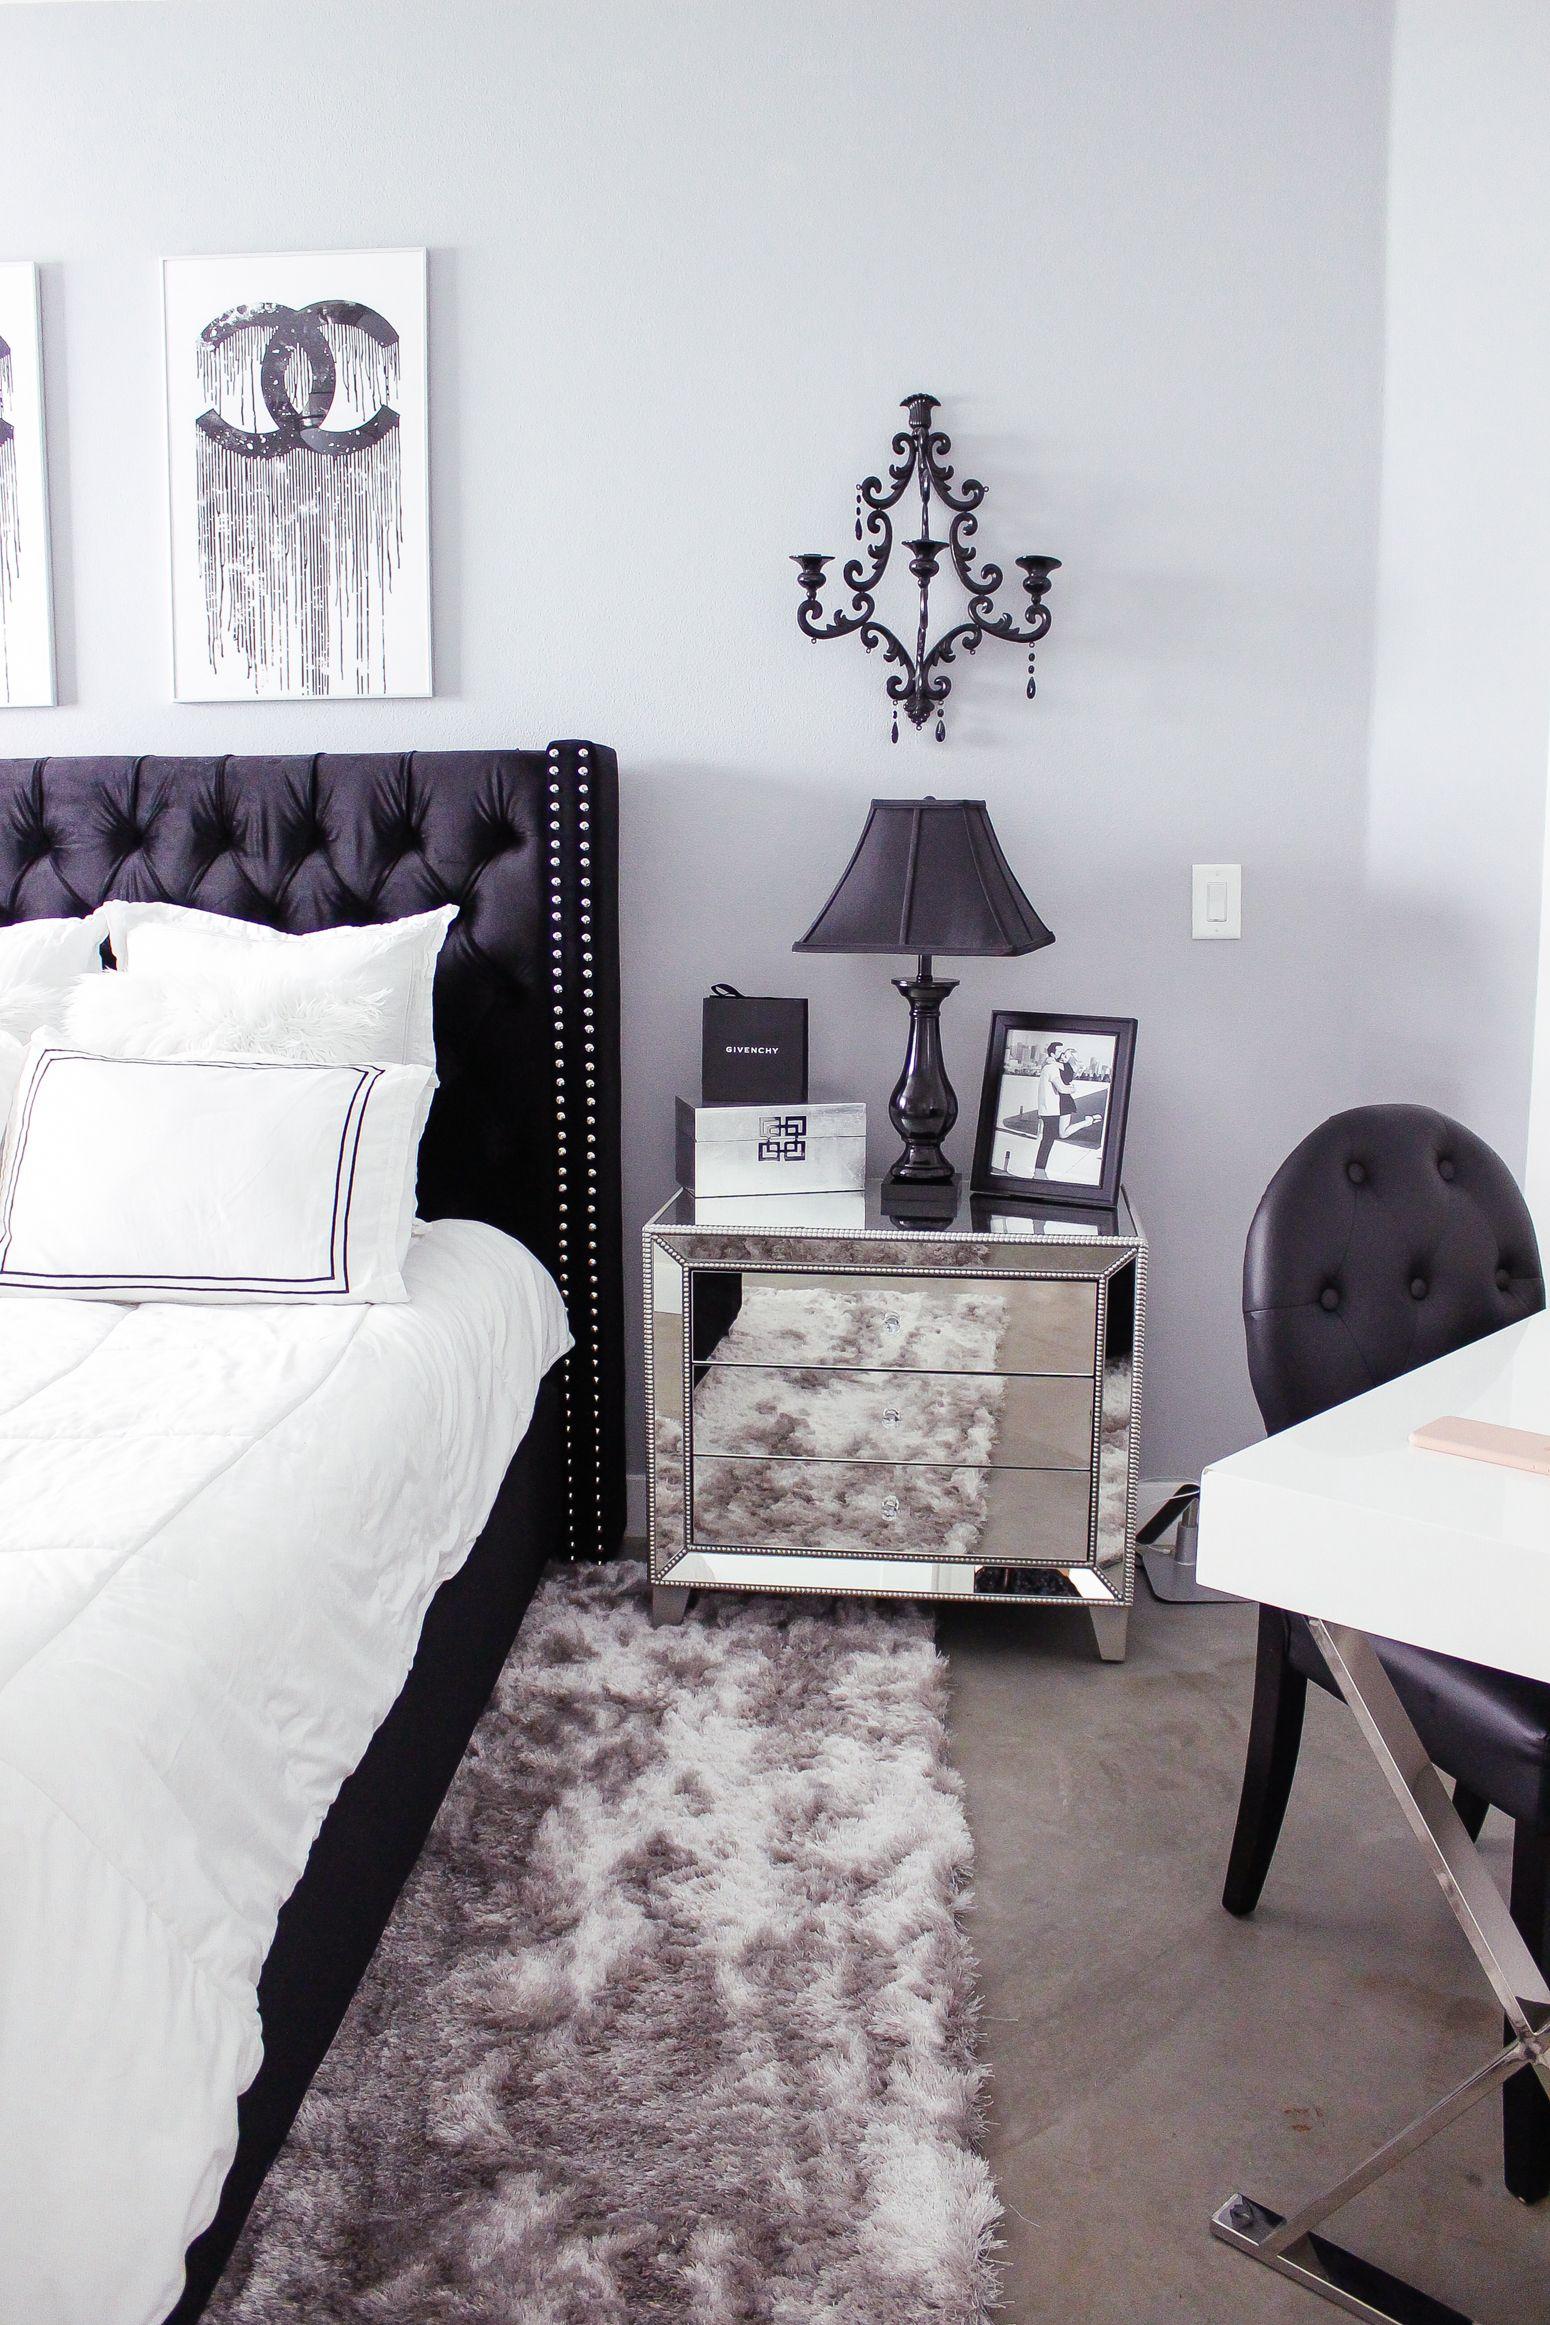 Black U0026 White Bedroom Decor | Chic, Glam Bedroom Decor | Blondie In The City